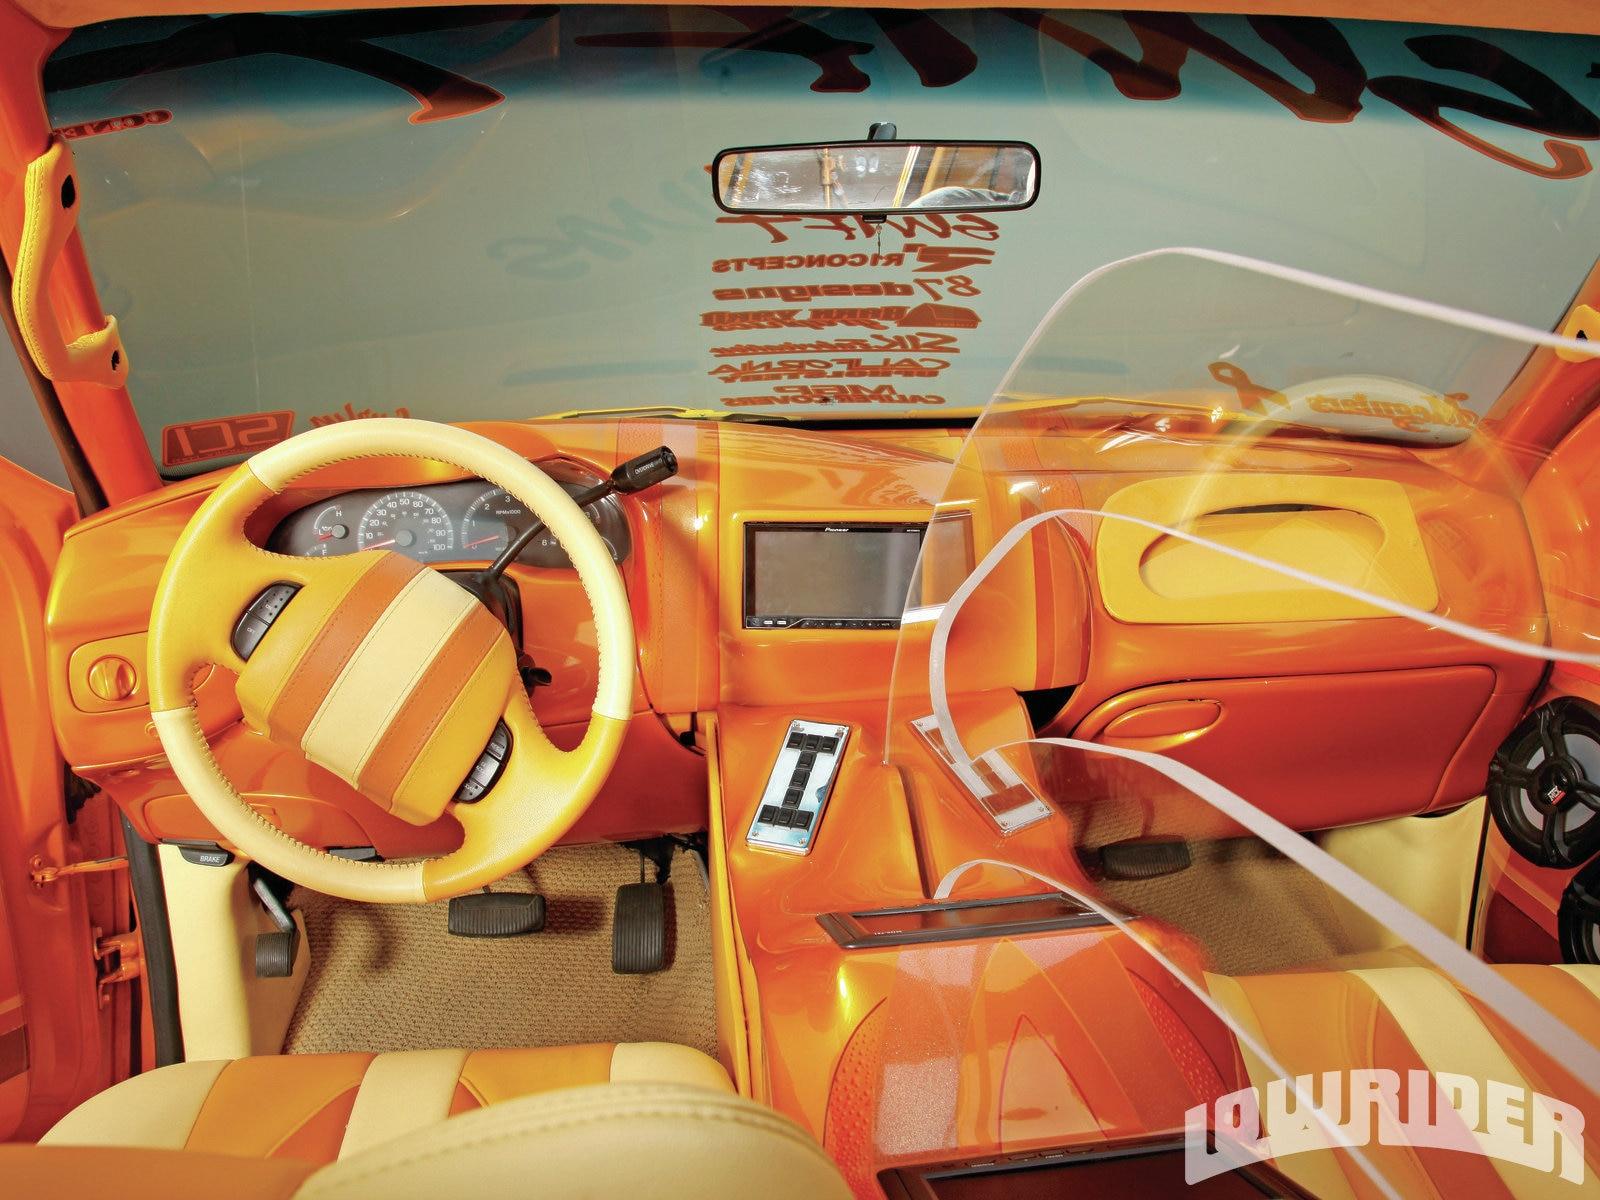 2001 Ford F-150 - Lowrider Magazine